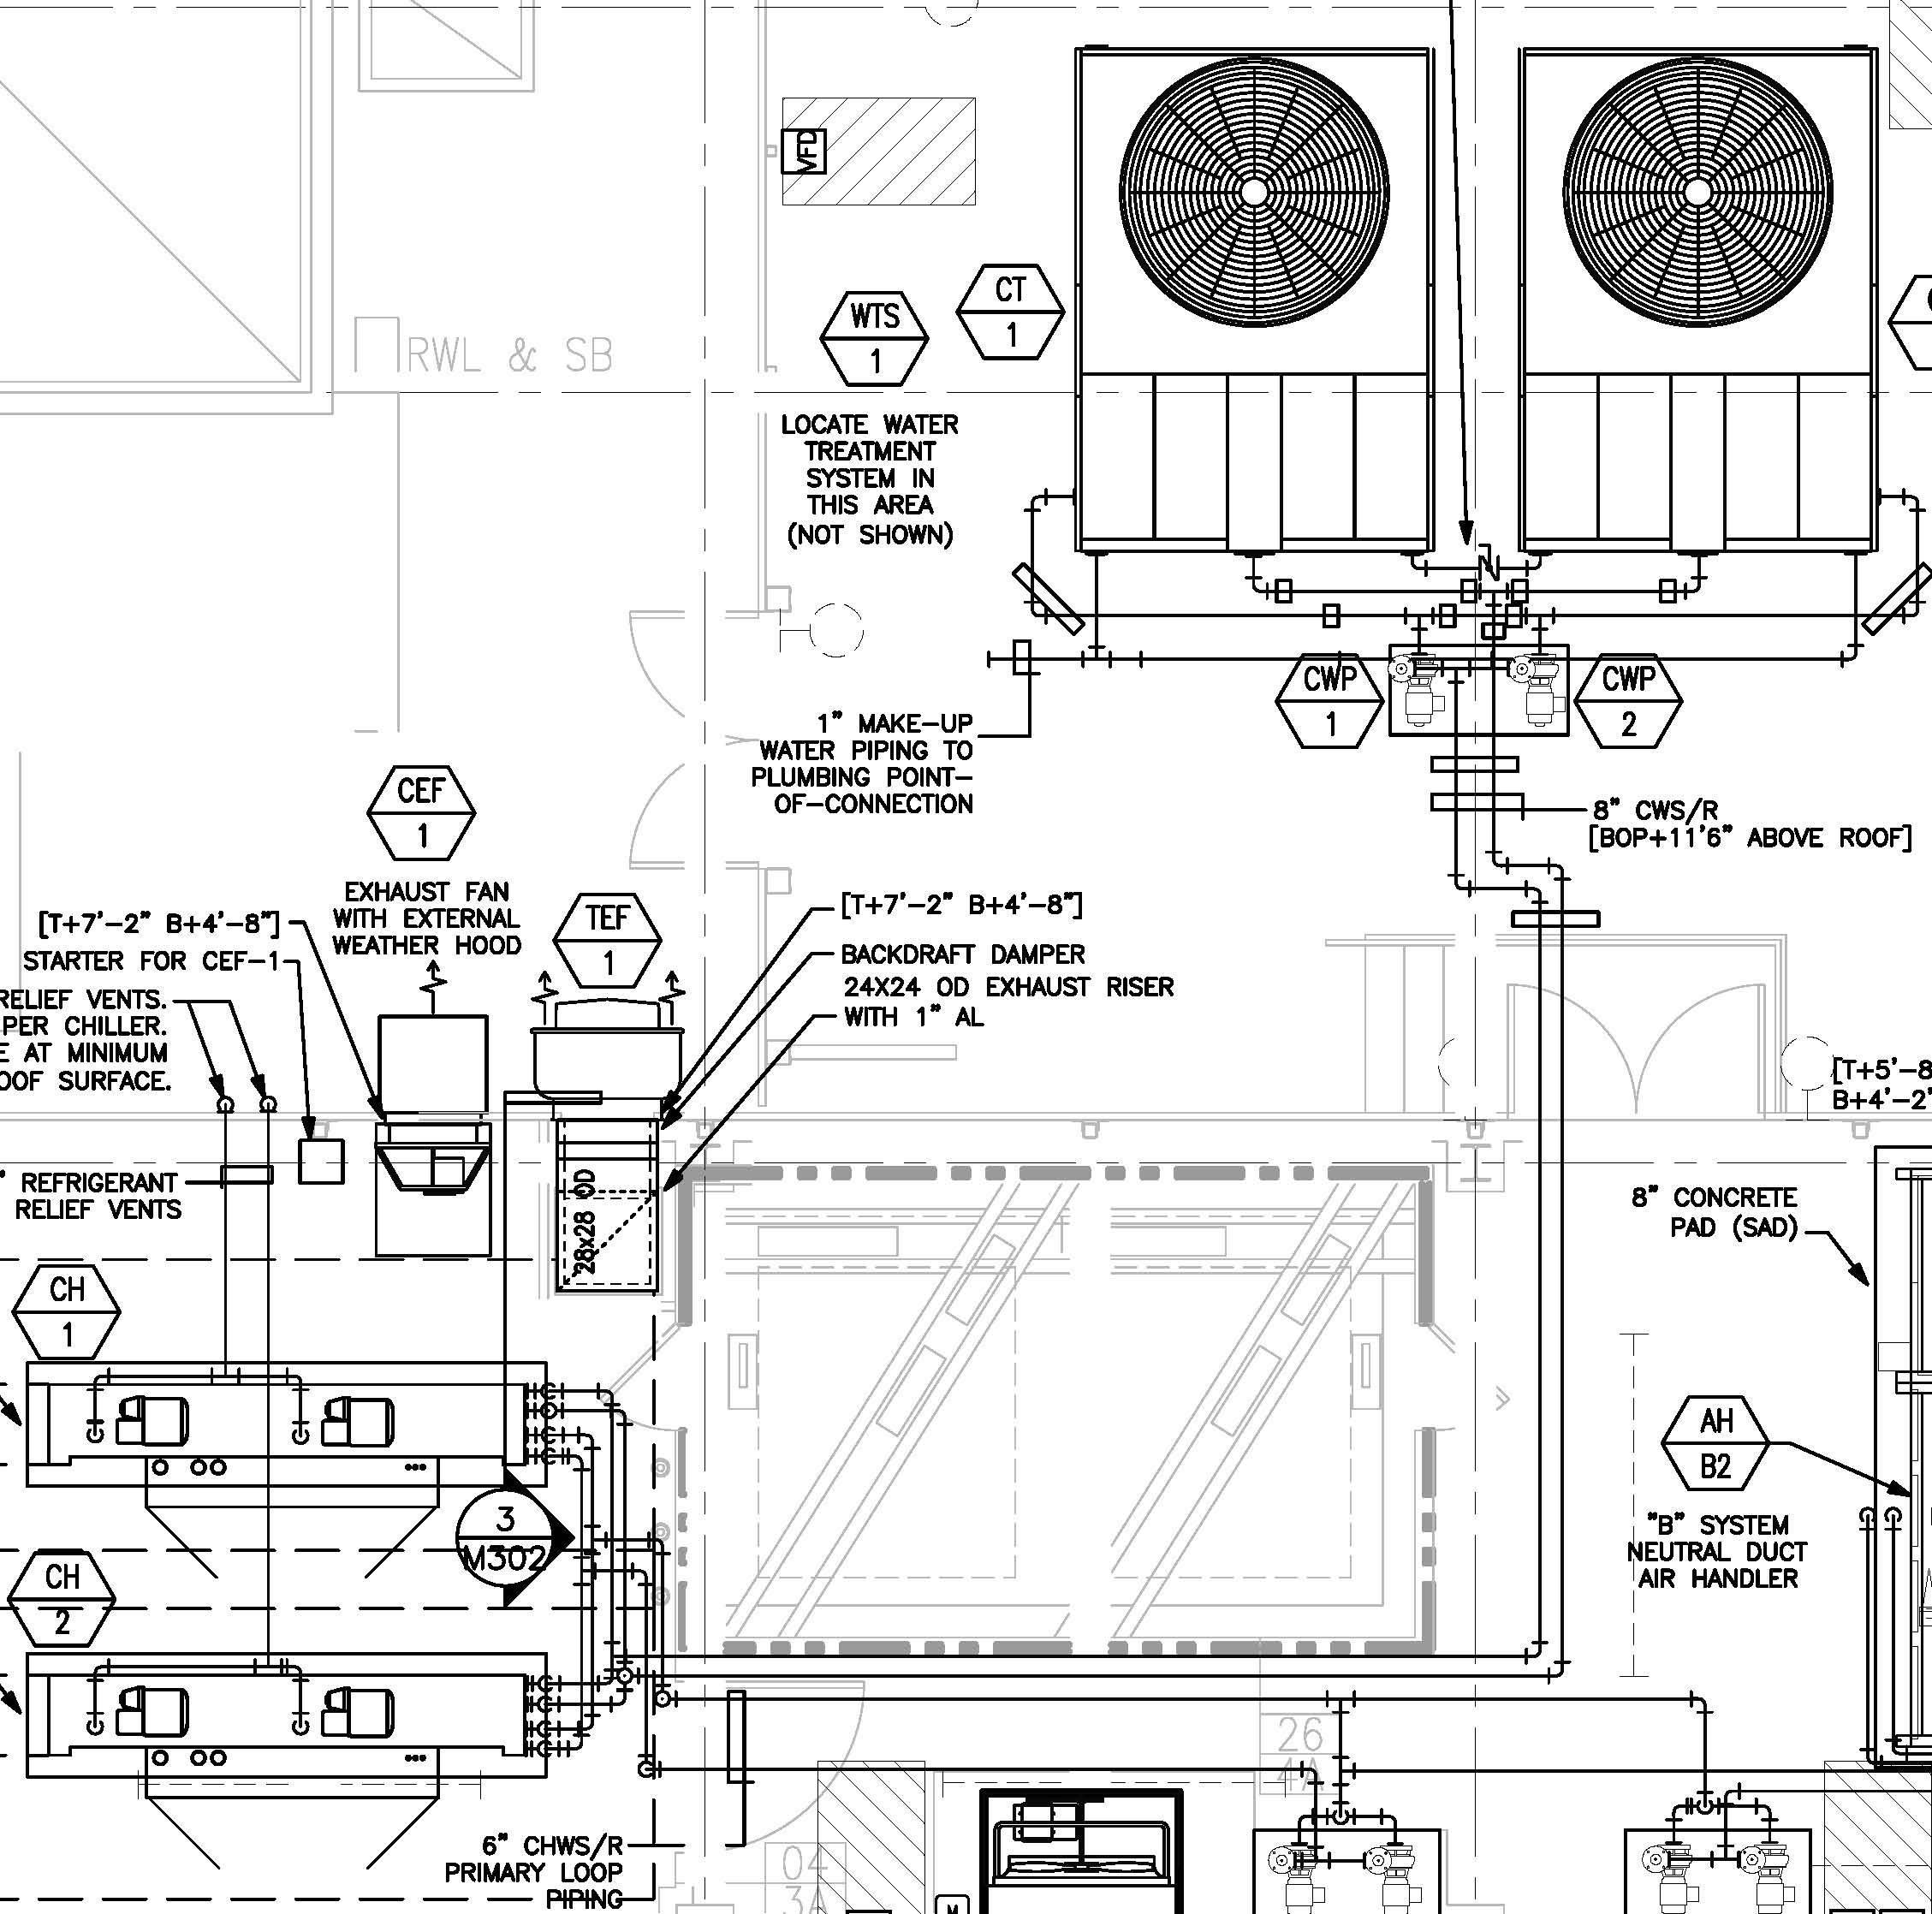 Mazda 323 Engine Diagram Mazda Protege Hvac System Wiring Diagram Worksheet and Wiring Of Mazda 323 Engine Diagram